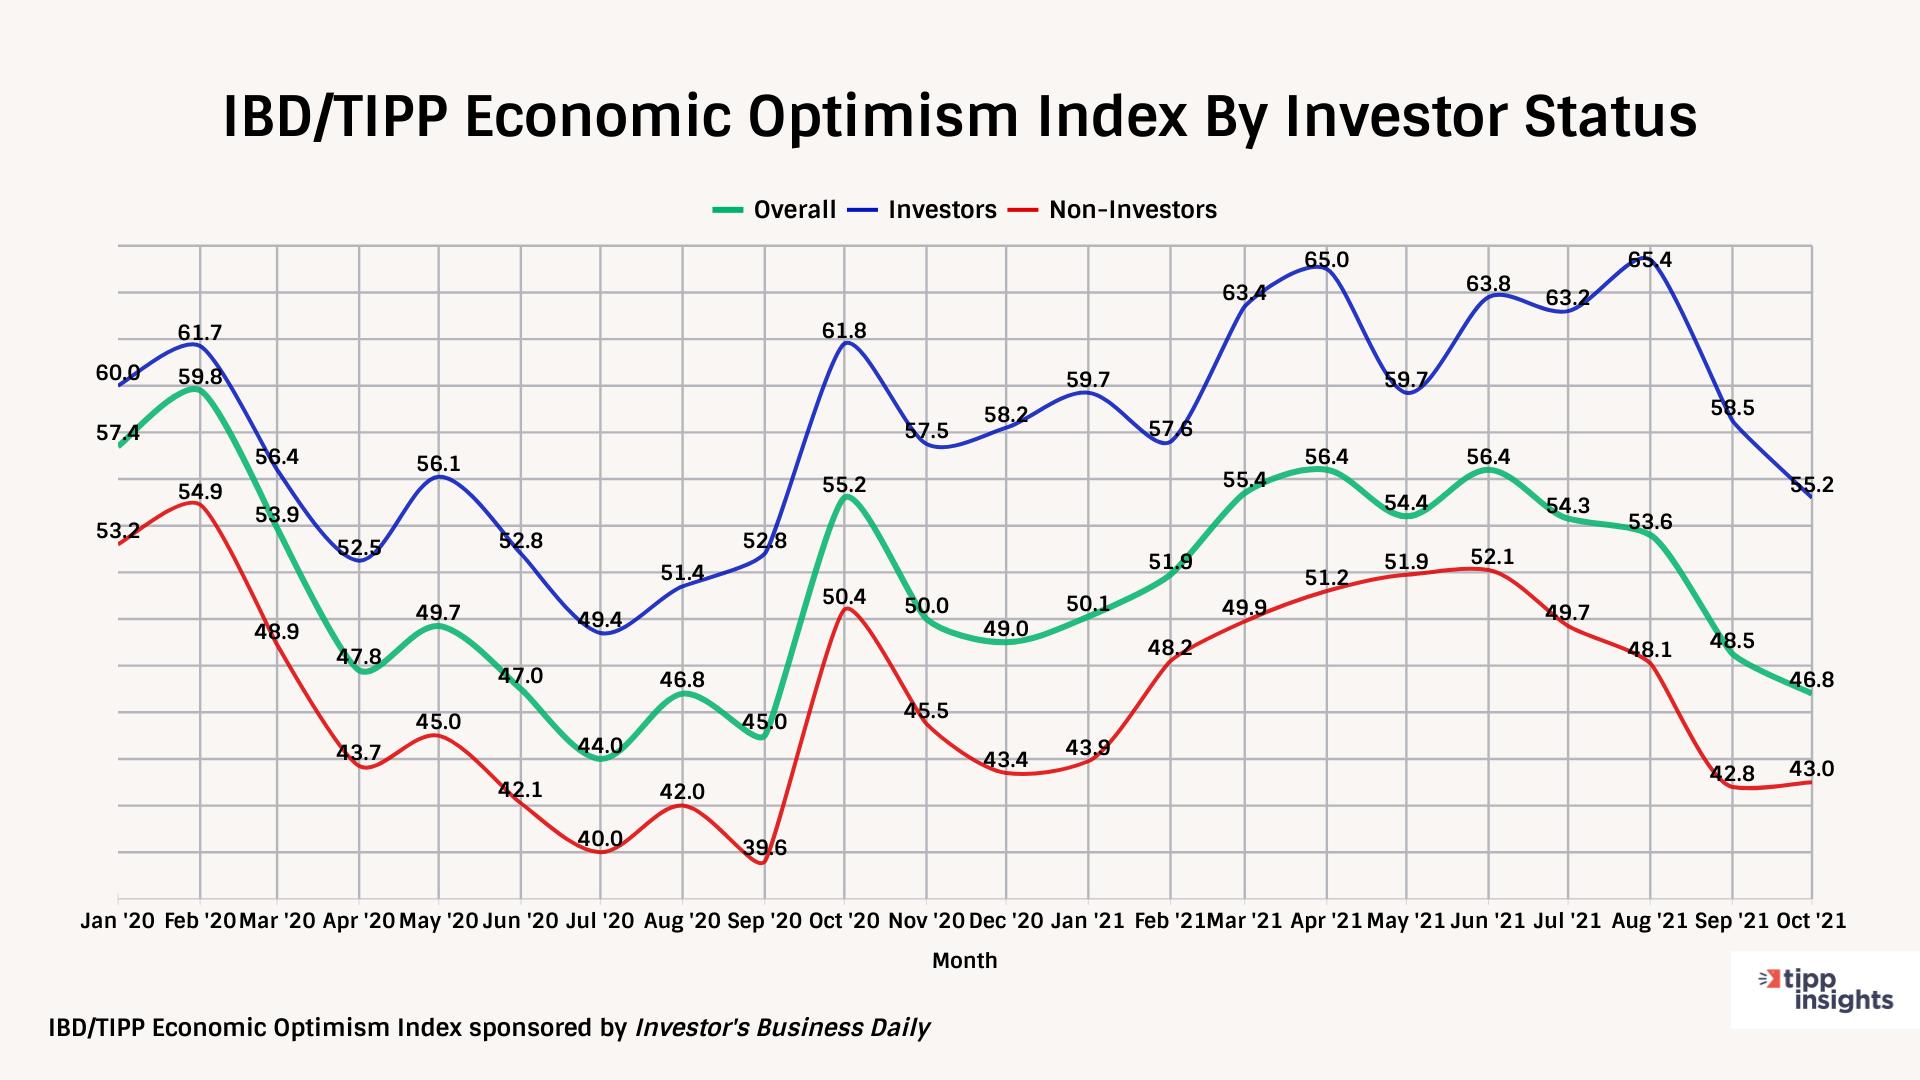 IBD/TIPP Economic Optimism Tracking Chart By Investor Status